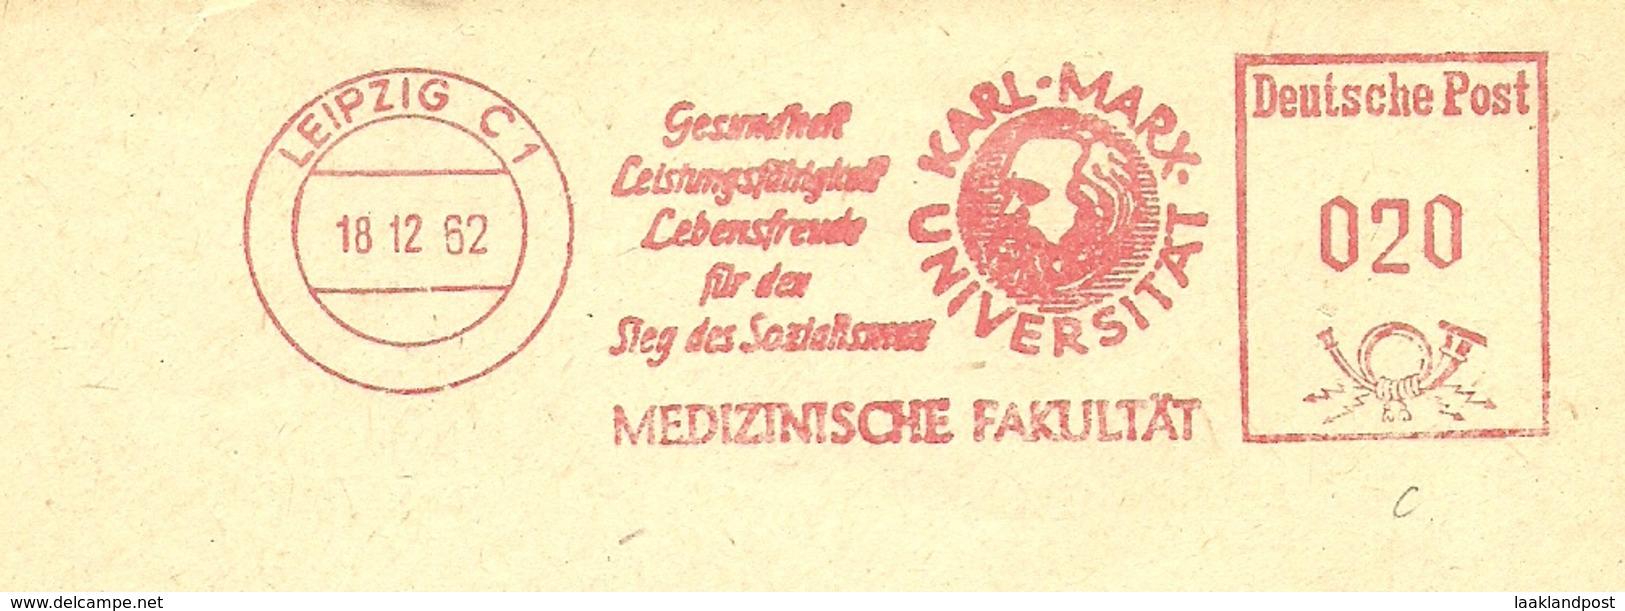 Firmcover Meter Karl-Max-Universitat Medizinische Fakultat Gesundheit Leipzig 18/2/1962 - Medizin